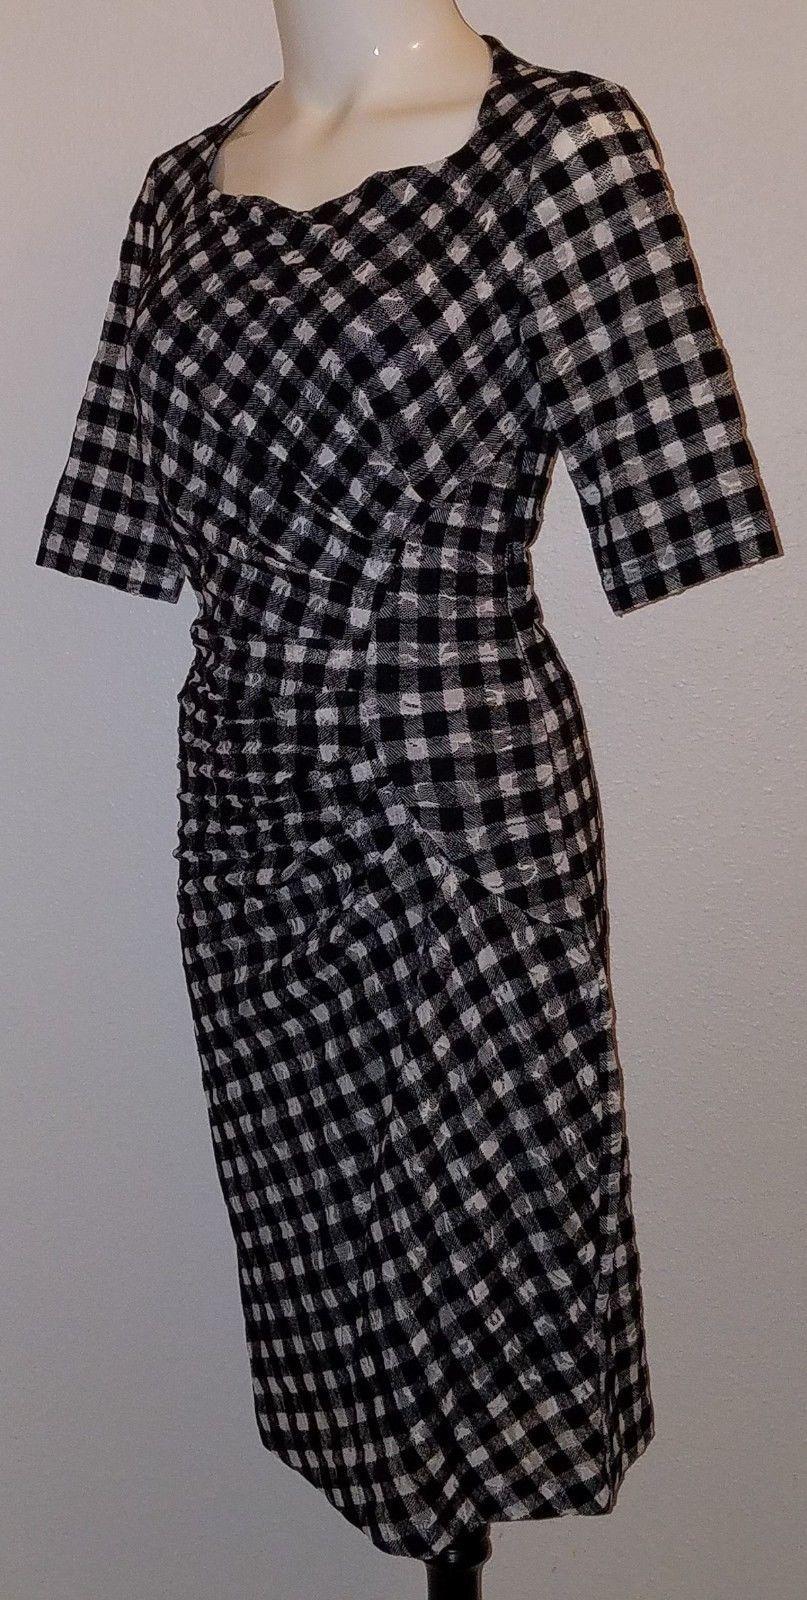 Maeve Anthropologie Black White Plaid Dress Size 2 Career Semi-Sheer Lined